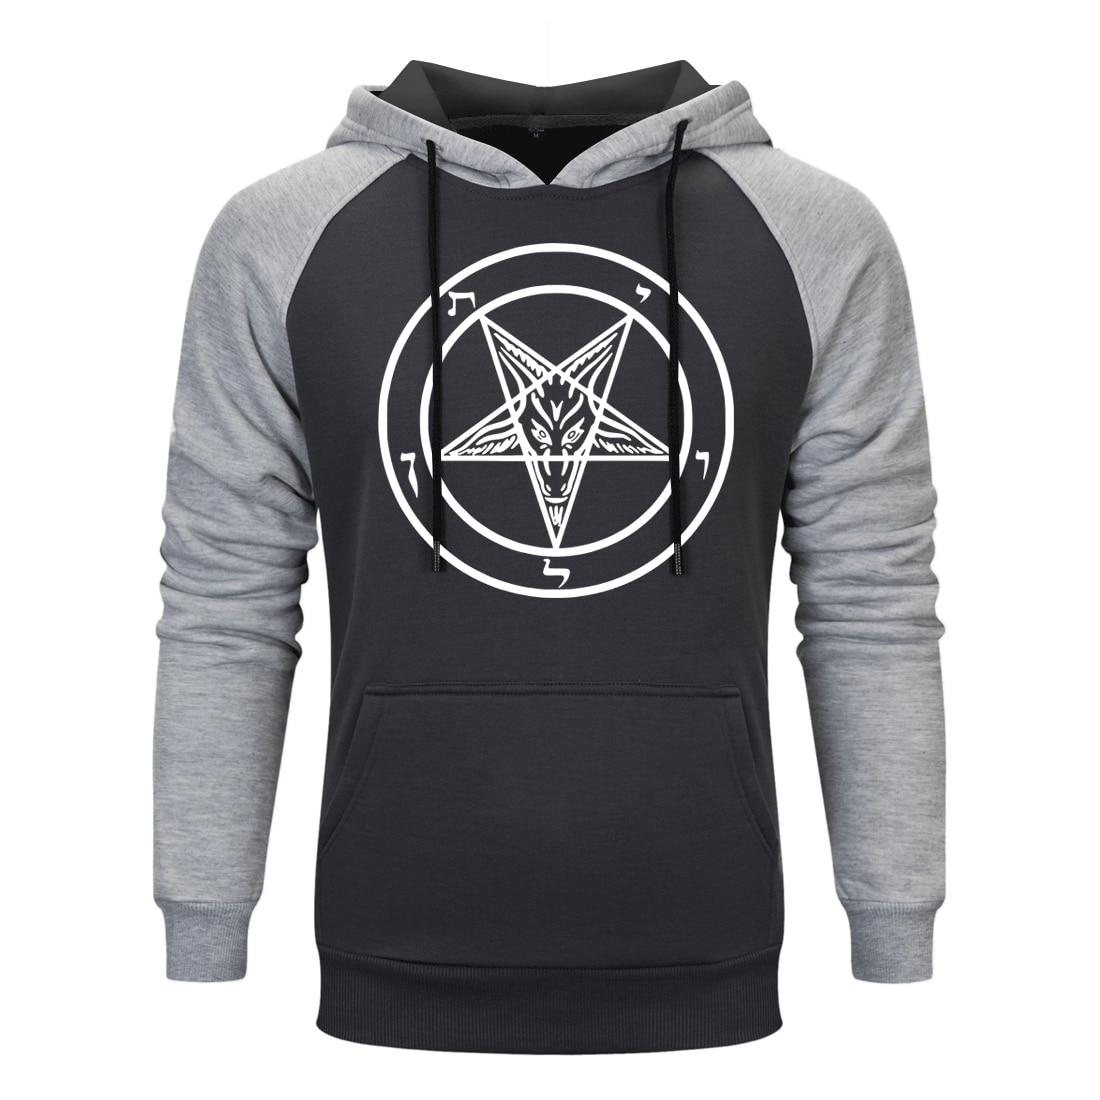 Spring Autumn Pentagram Gothic Occult Hooded Men Satan Vintage Print 2020 New Sweatshirts Hip Hop Fahsion Warm Raglan Clothing